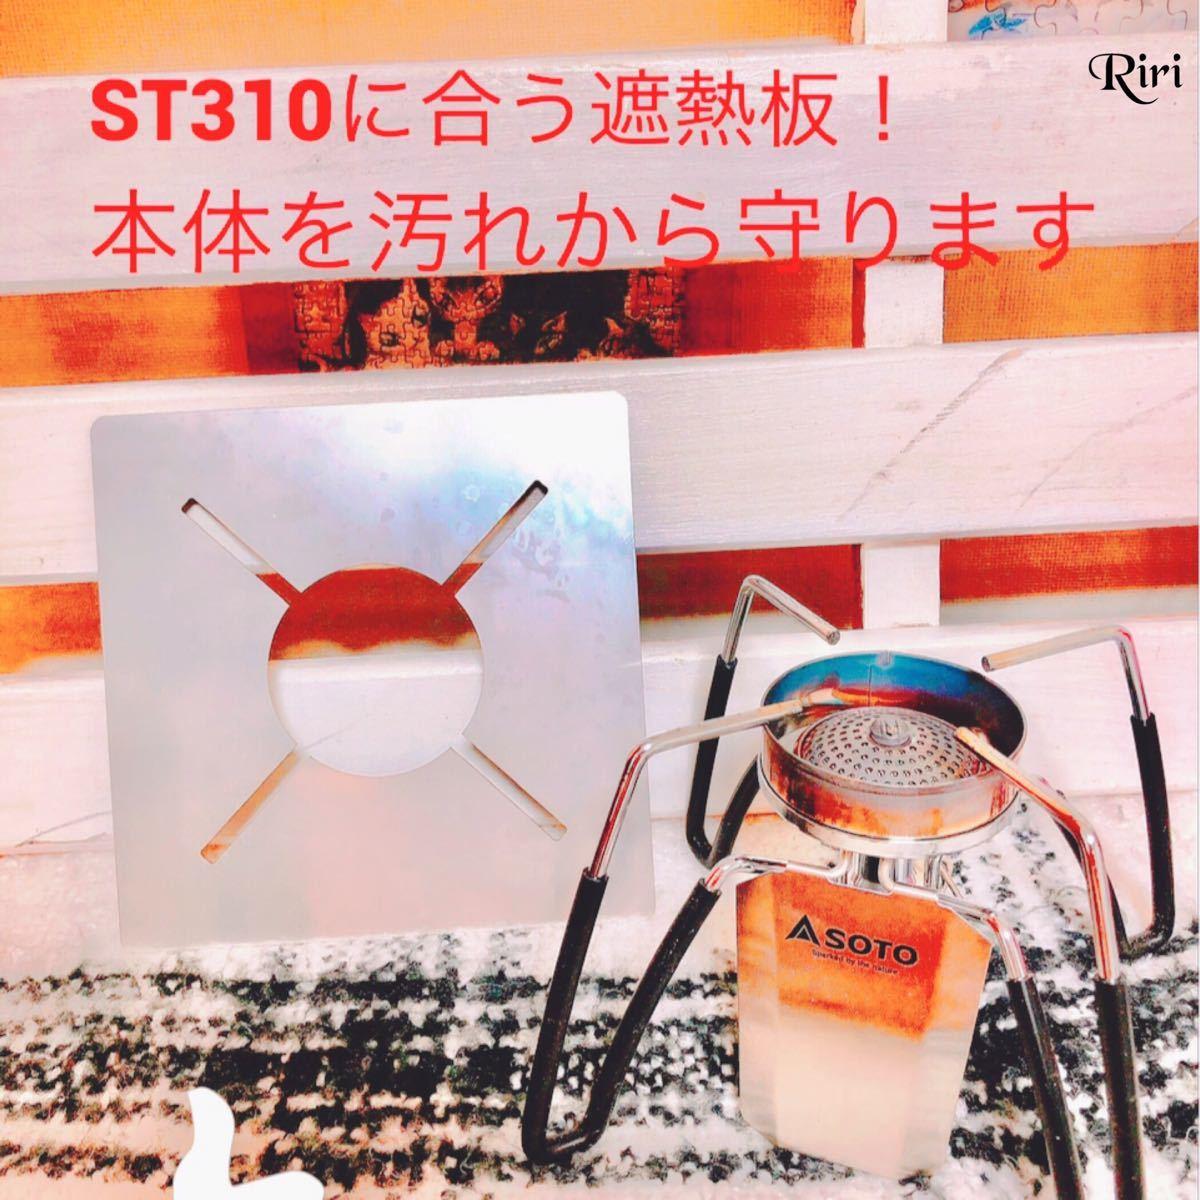 。SOTO /ST310にフィットする防風/耐熱性チューブ/遮熱板/3点セット